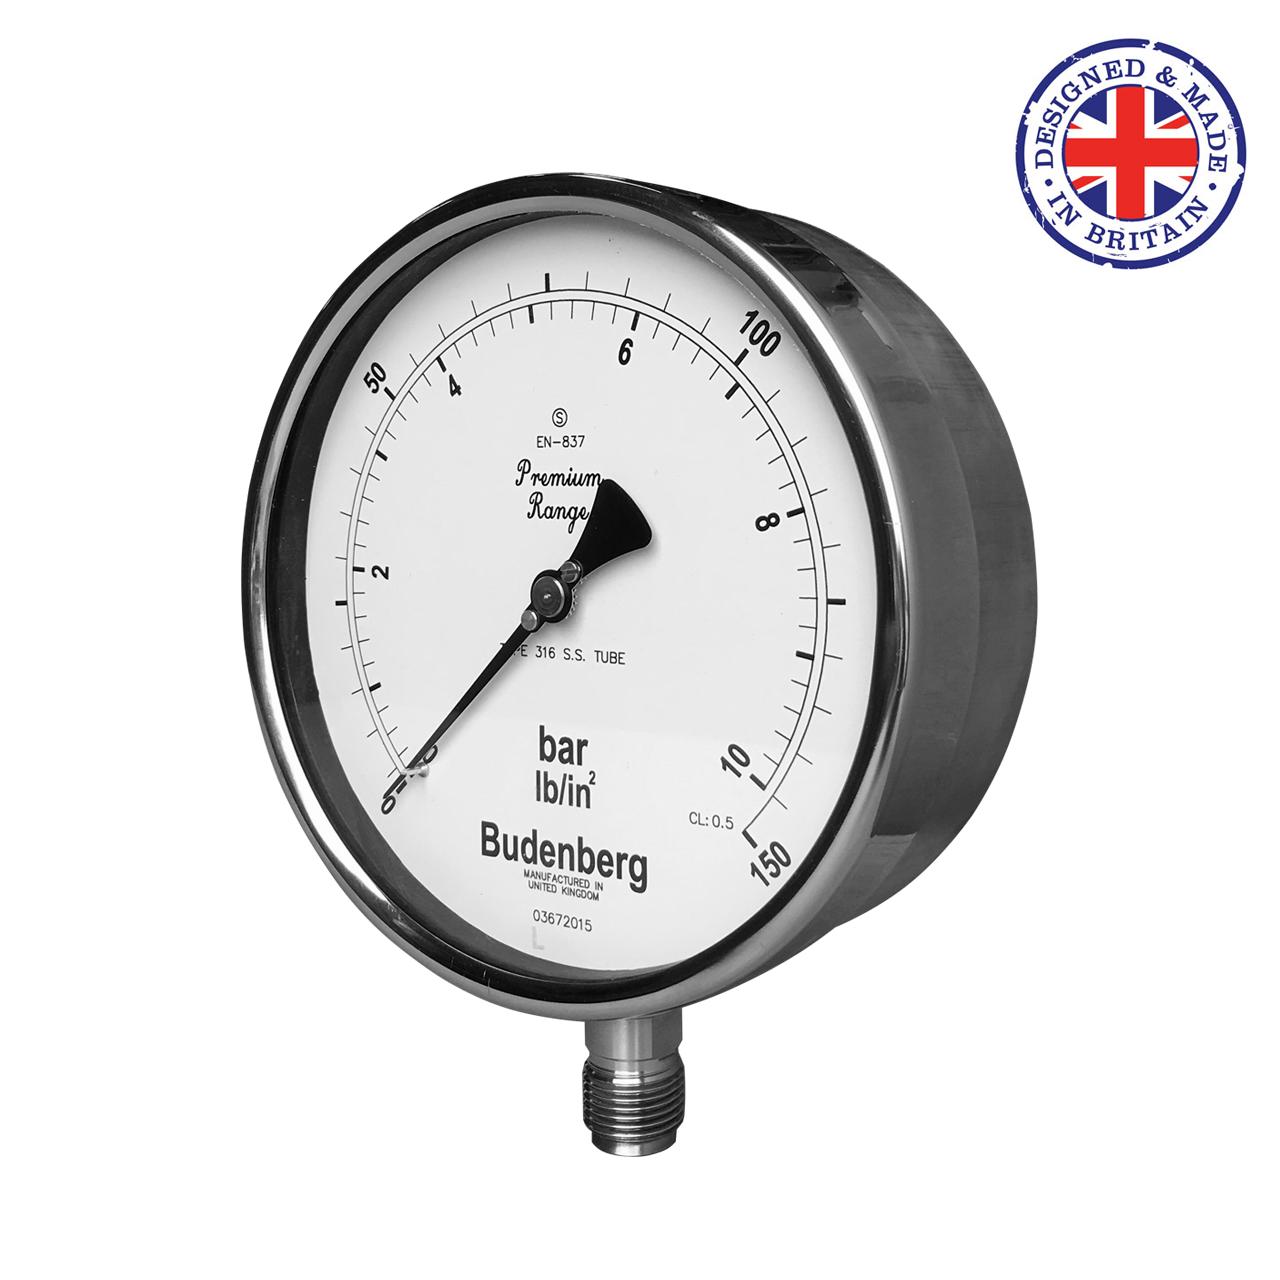 Budenberg 966mgp Monel Wetted Parts Pressure Gauge Pressure Gauge Gauges Relief Valve